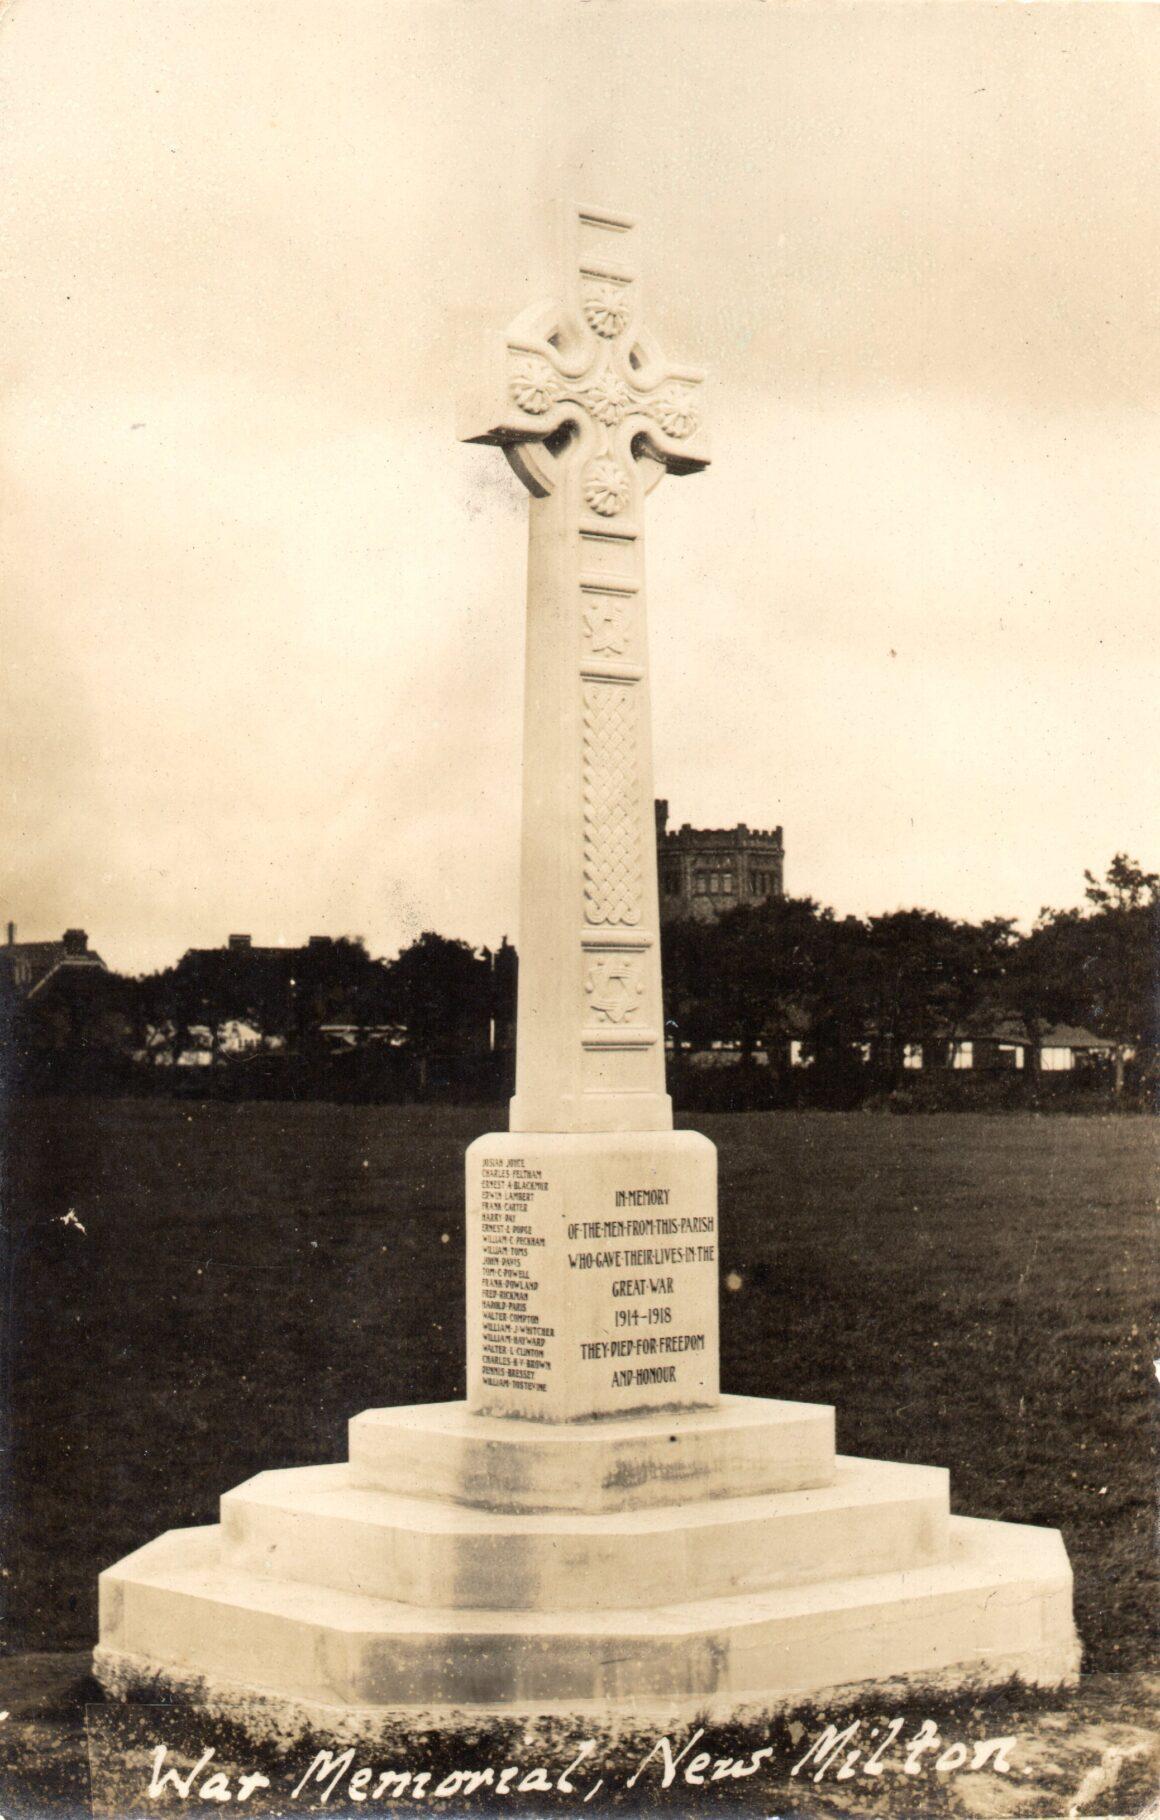 Centenary Anniversary of New Milton War Memorial